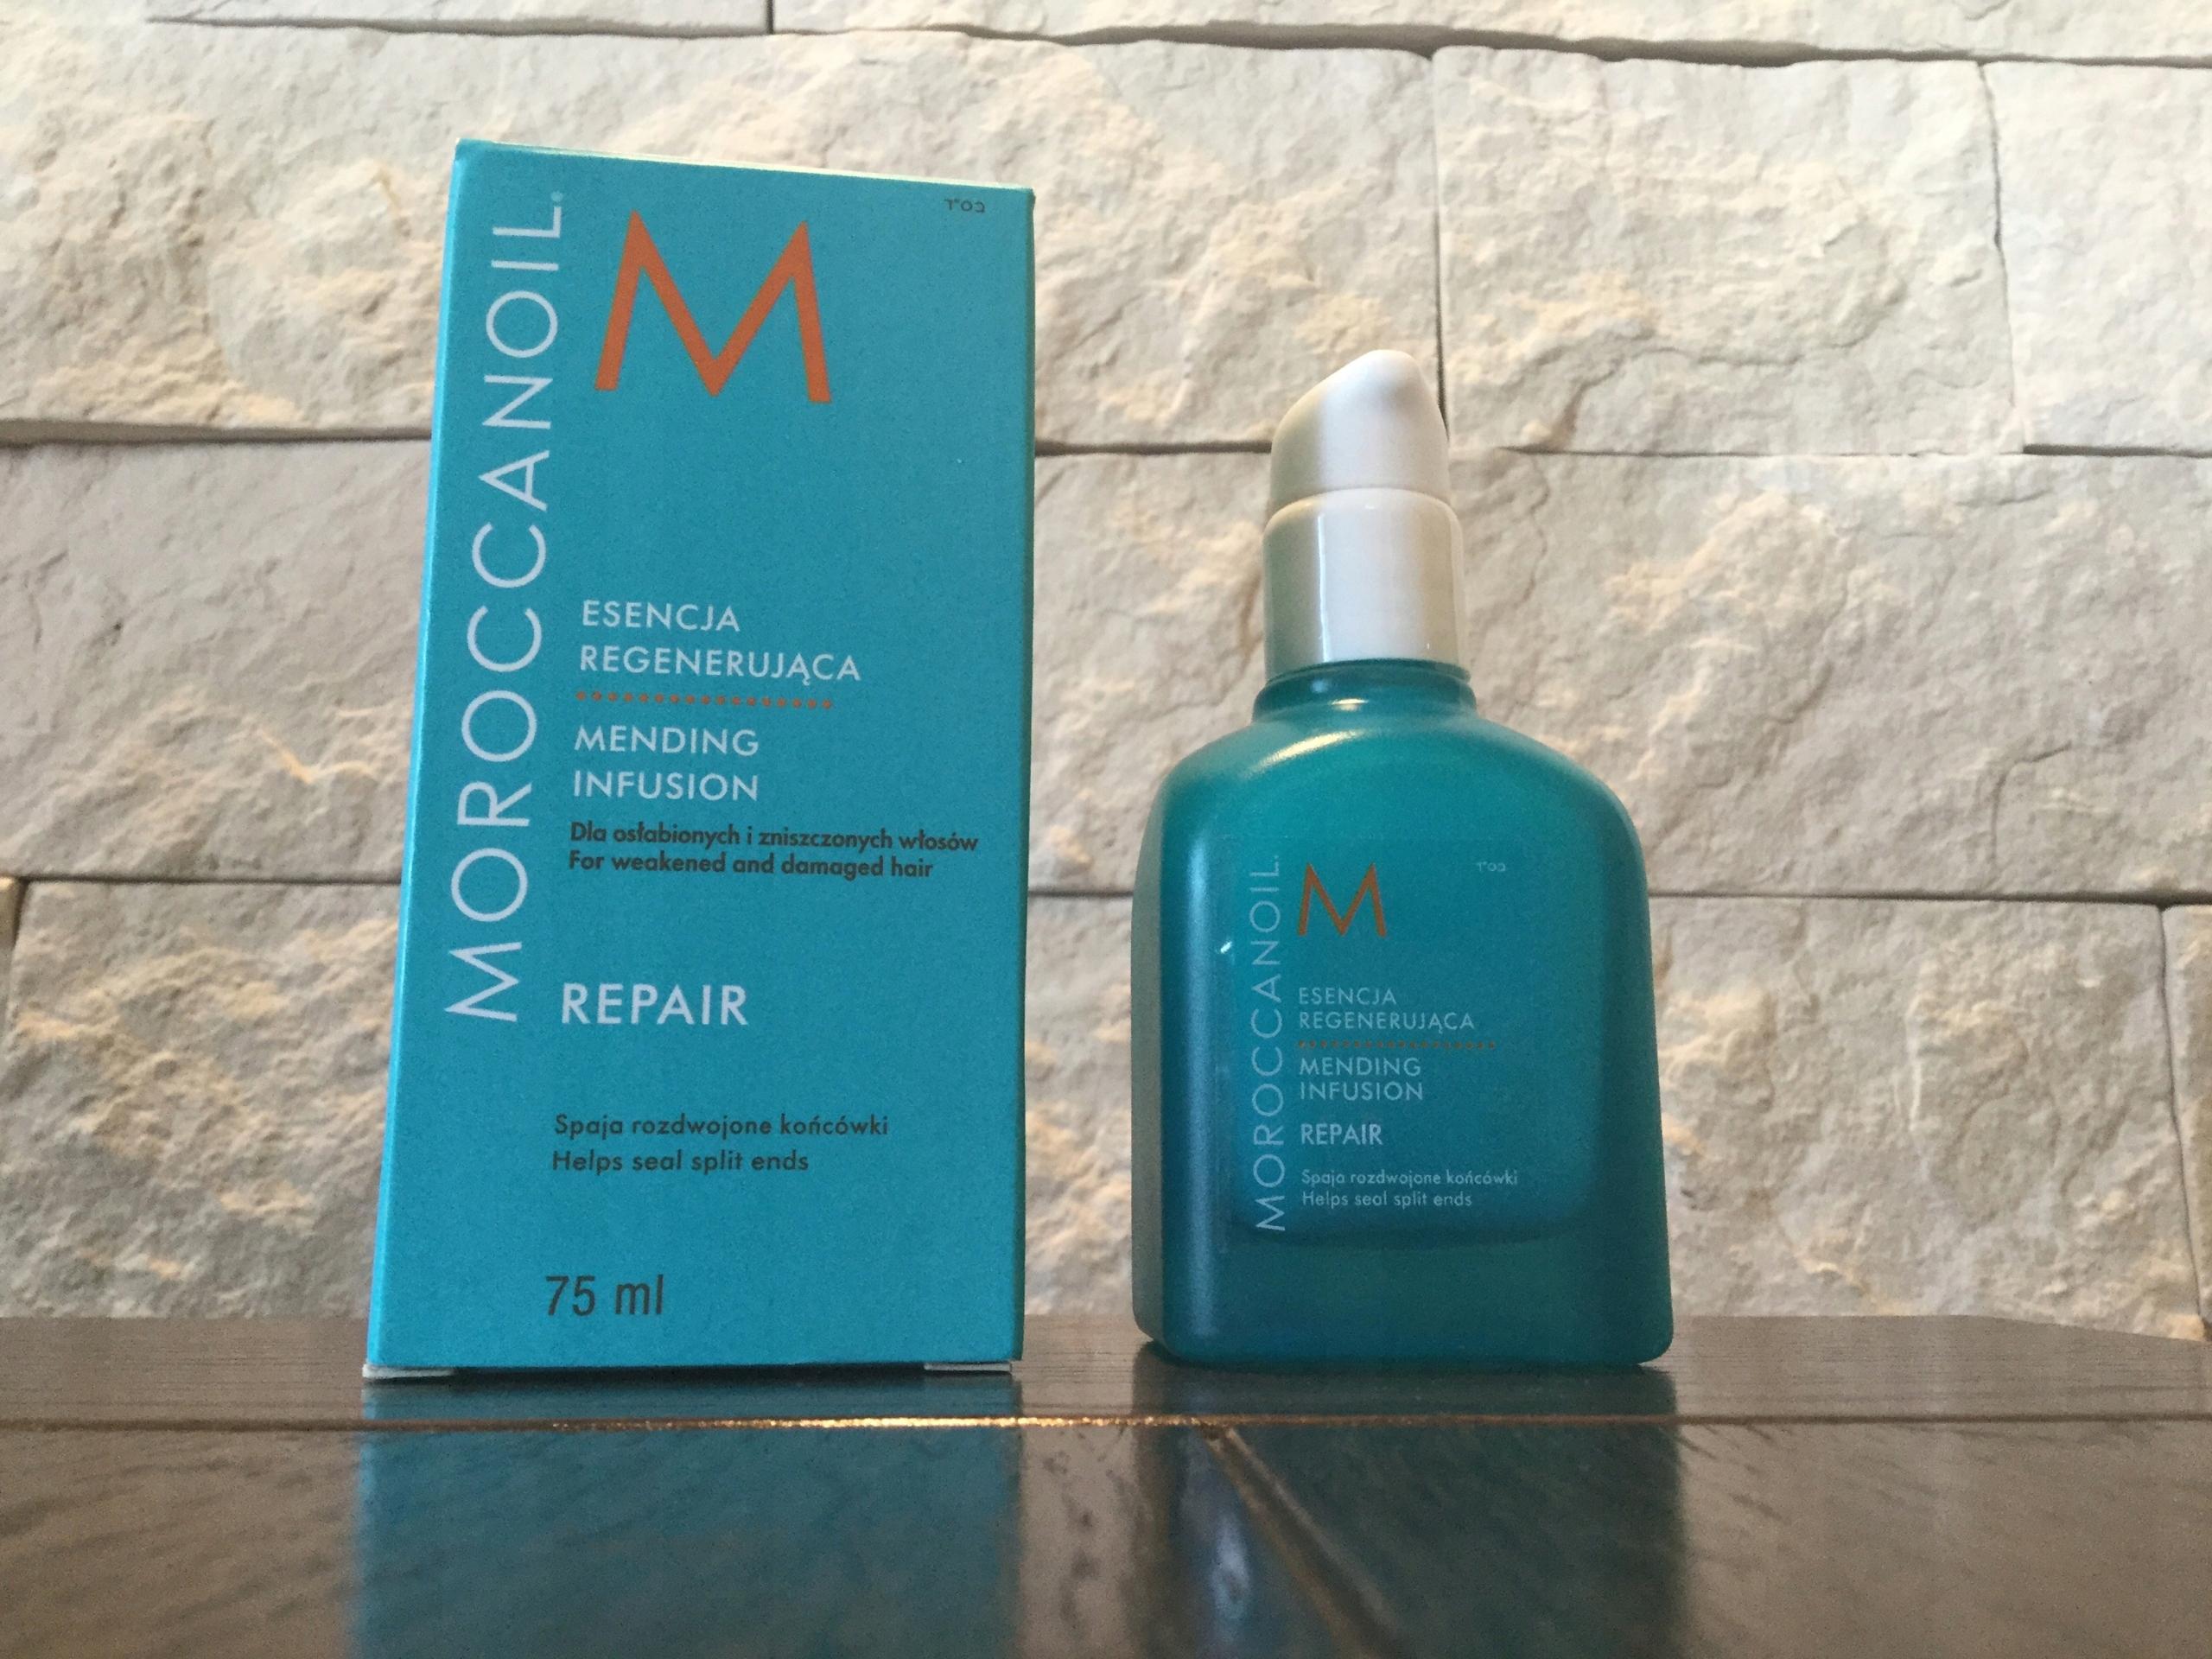 Moroccanoil Esencja regenerująca 75 ml Repair